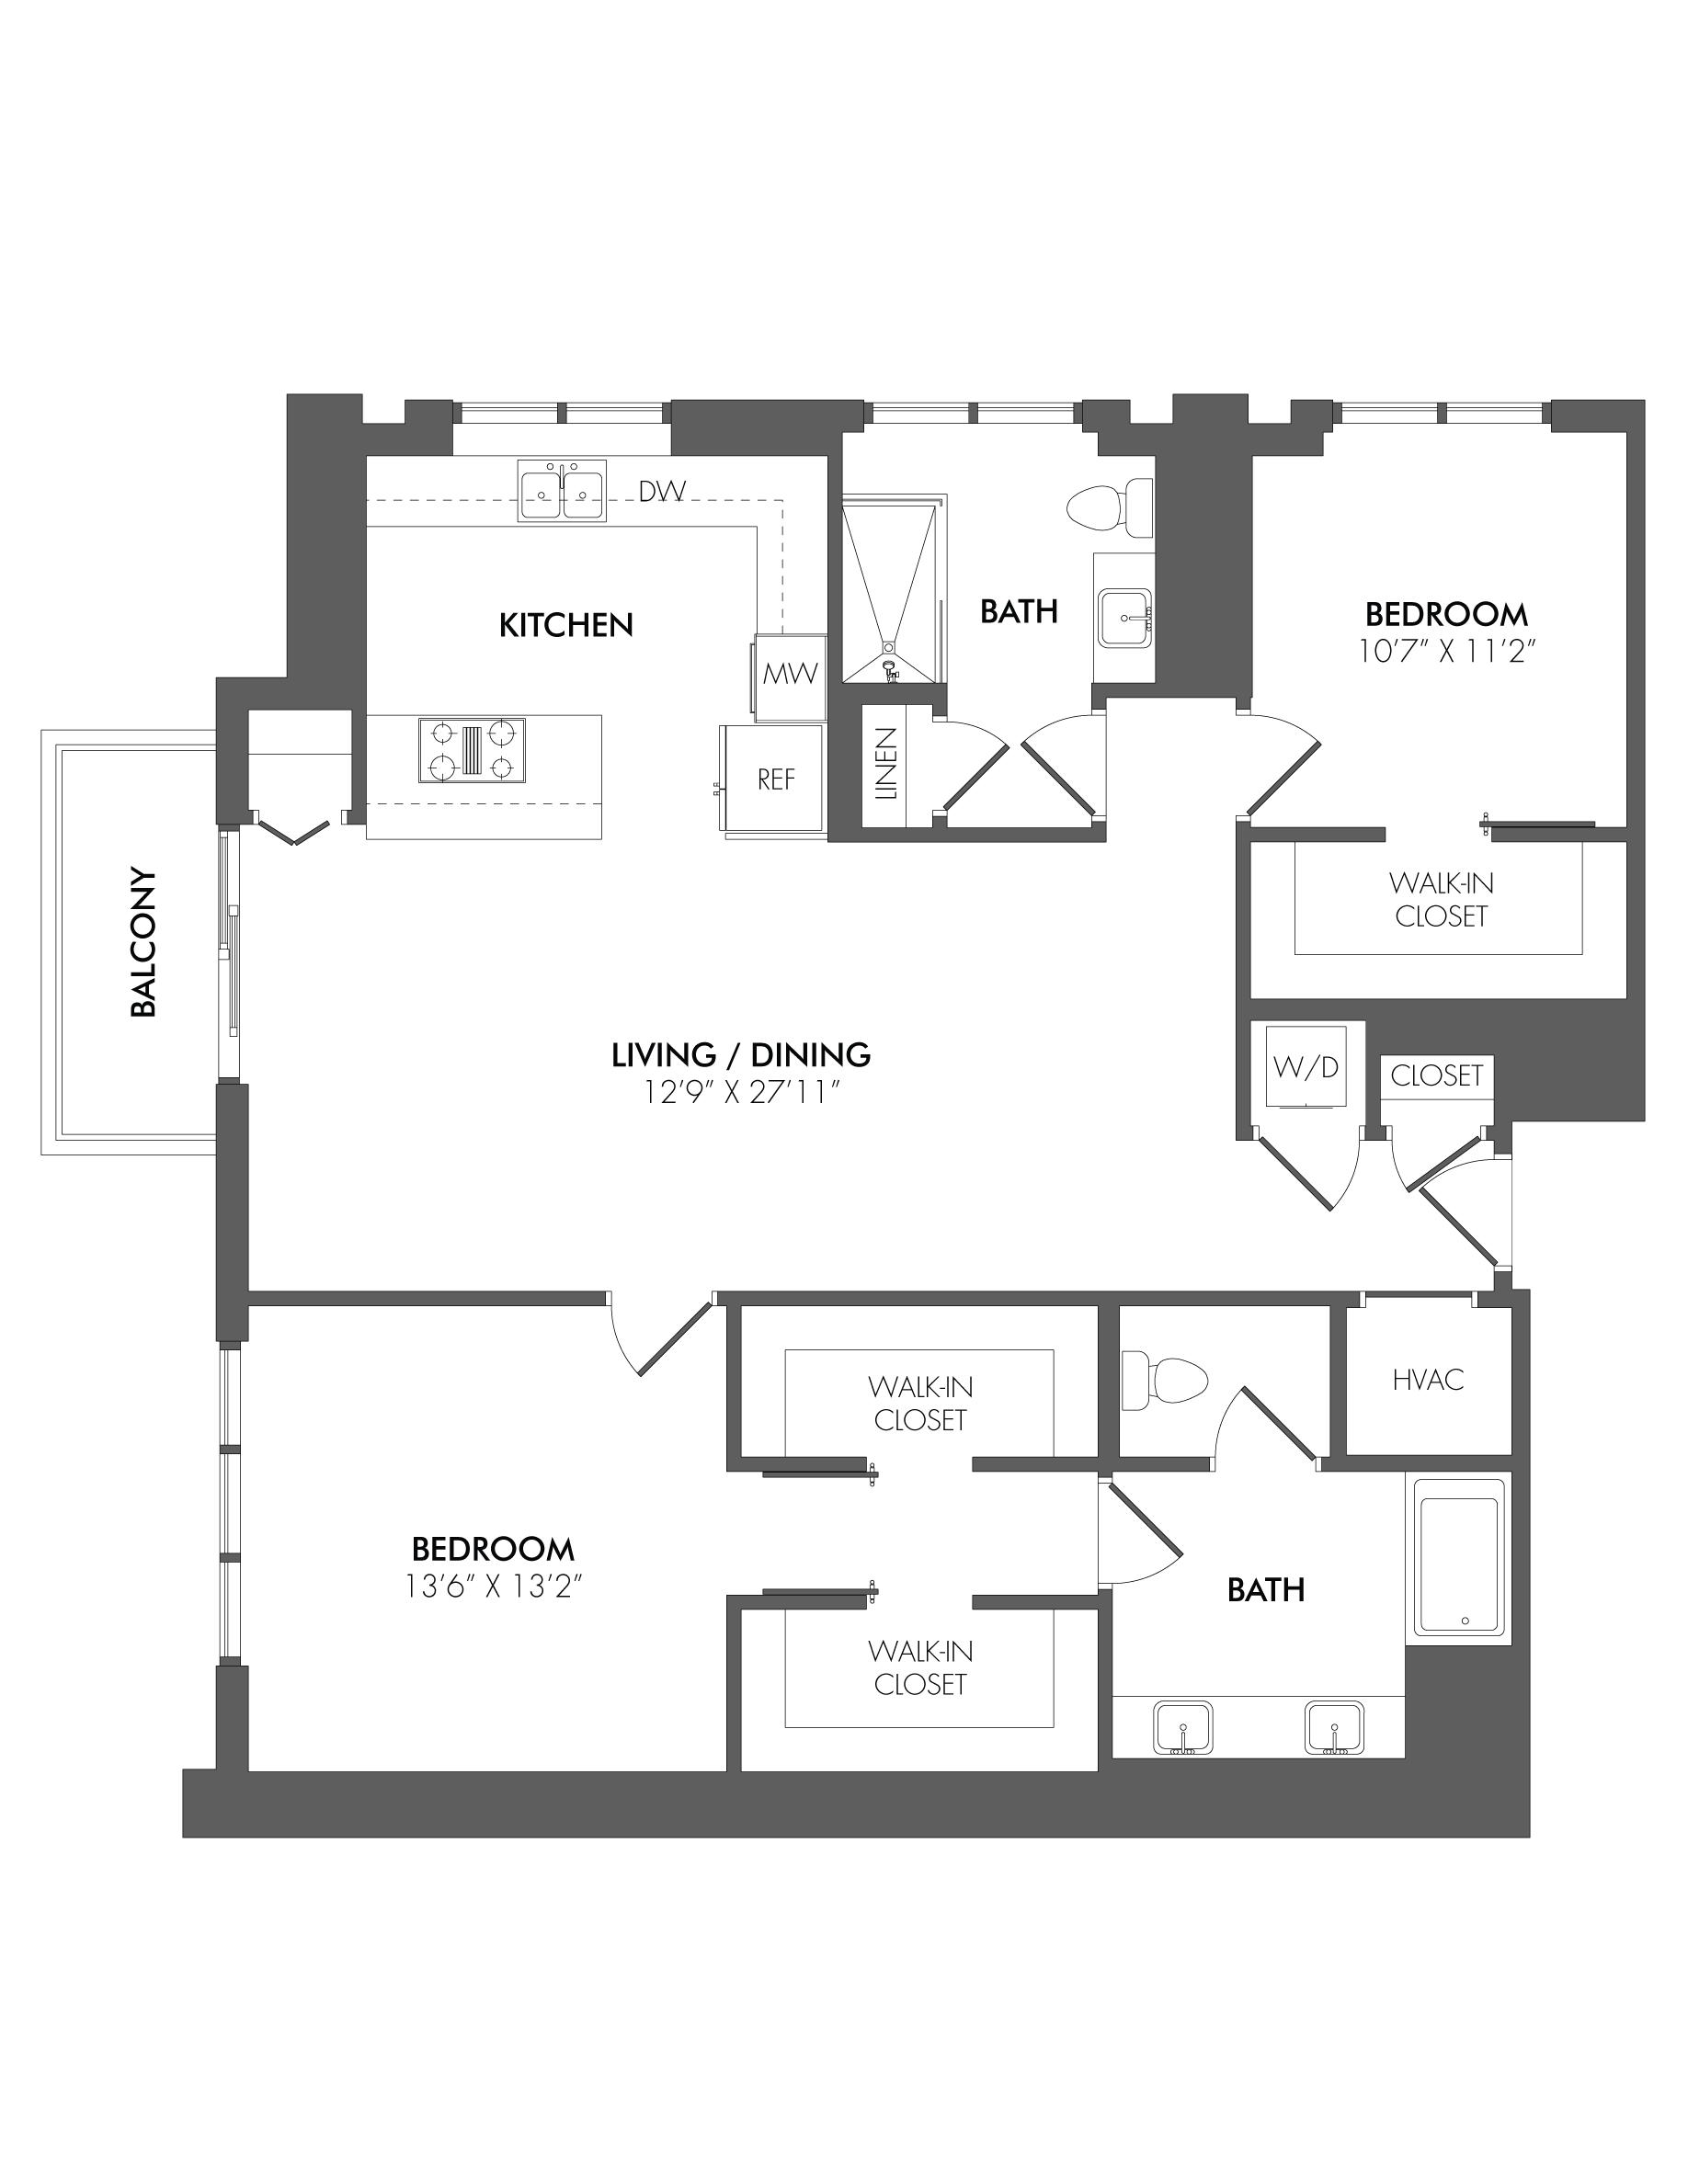 Apartment 4306 floorplan